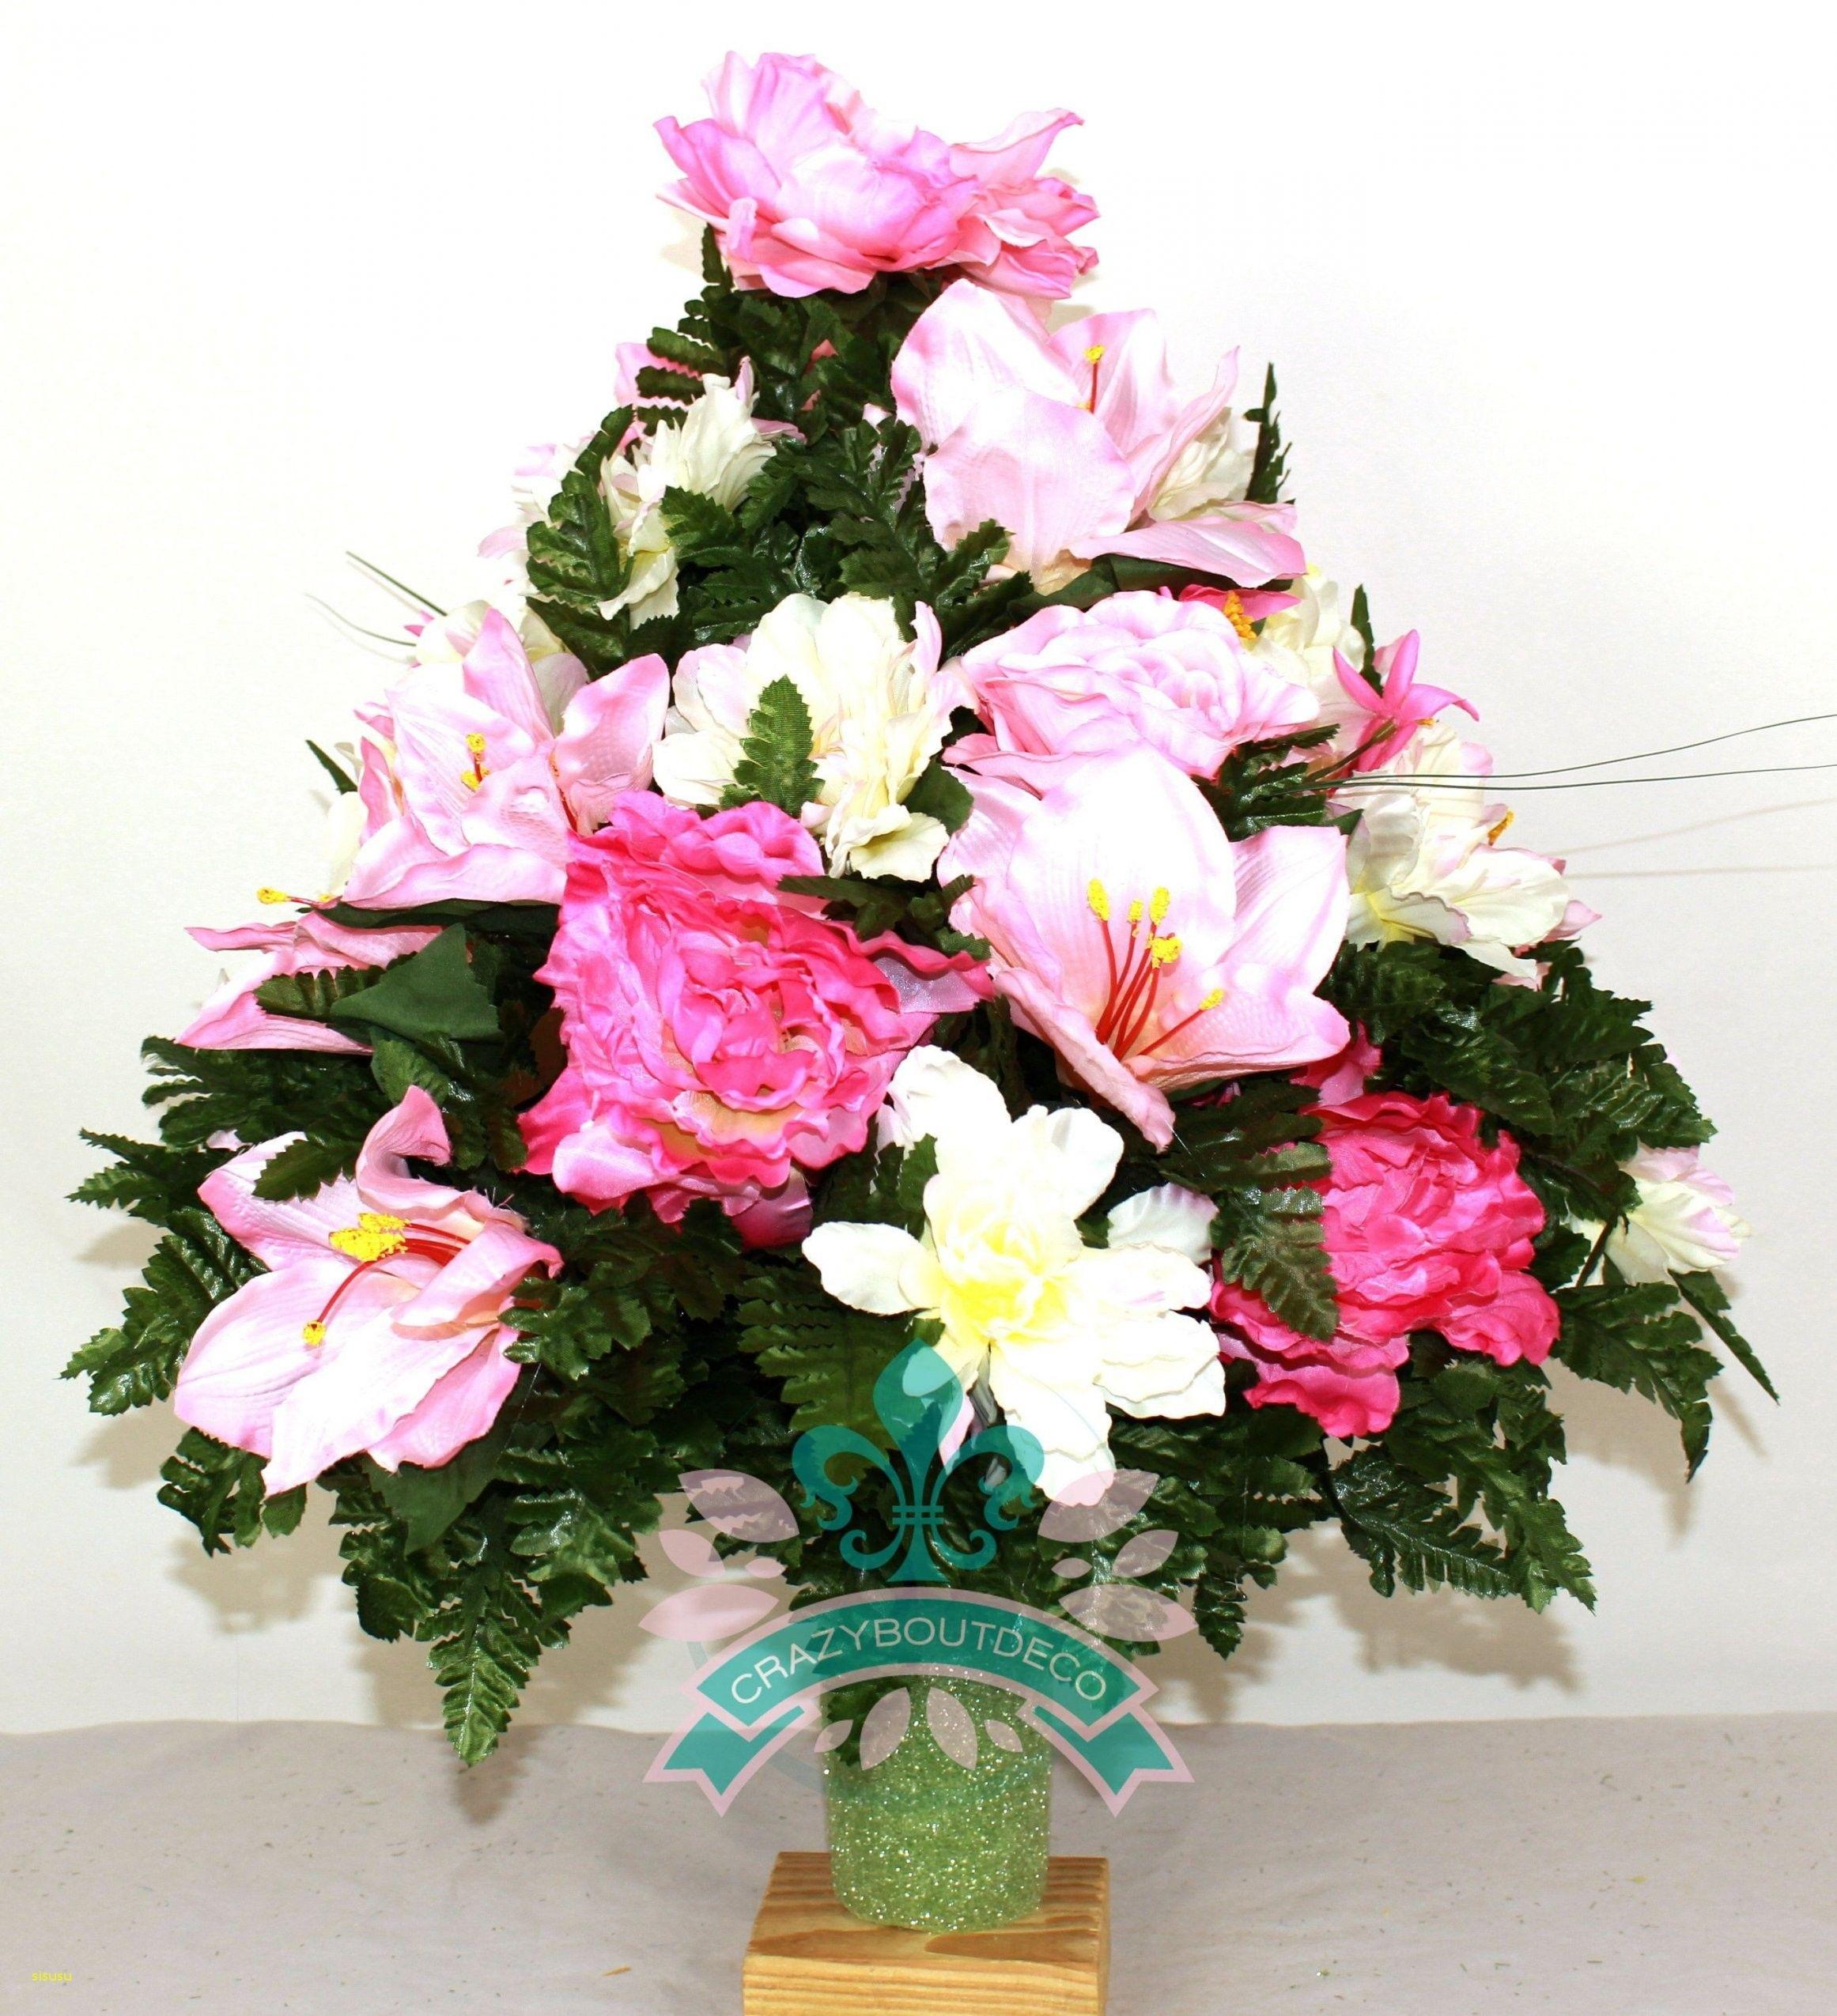 How to make silk flower arrangements for cemetery vases